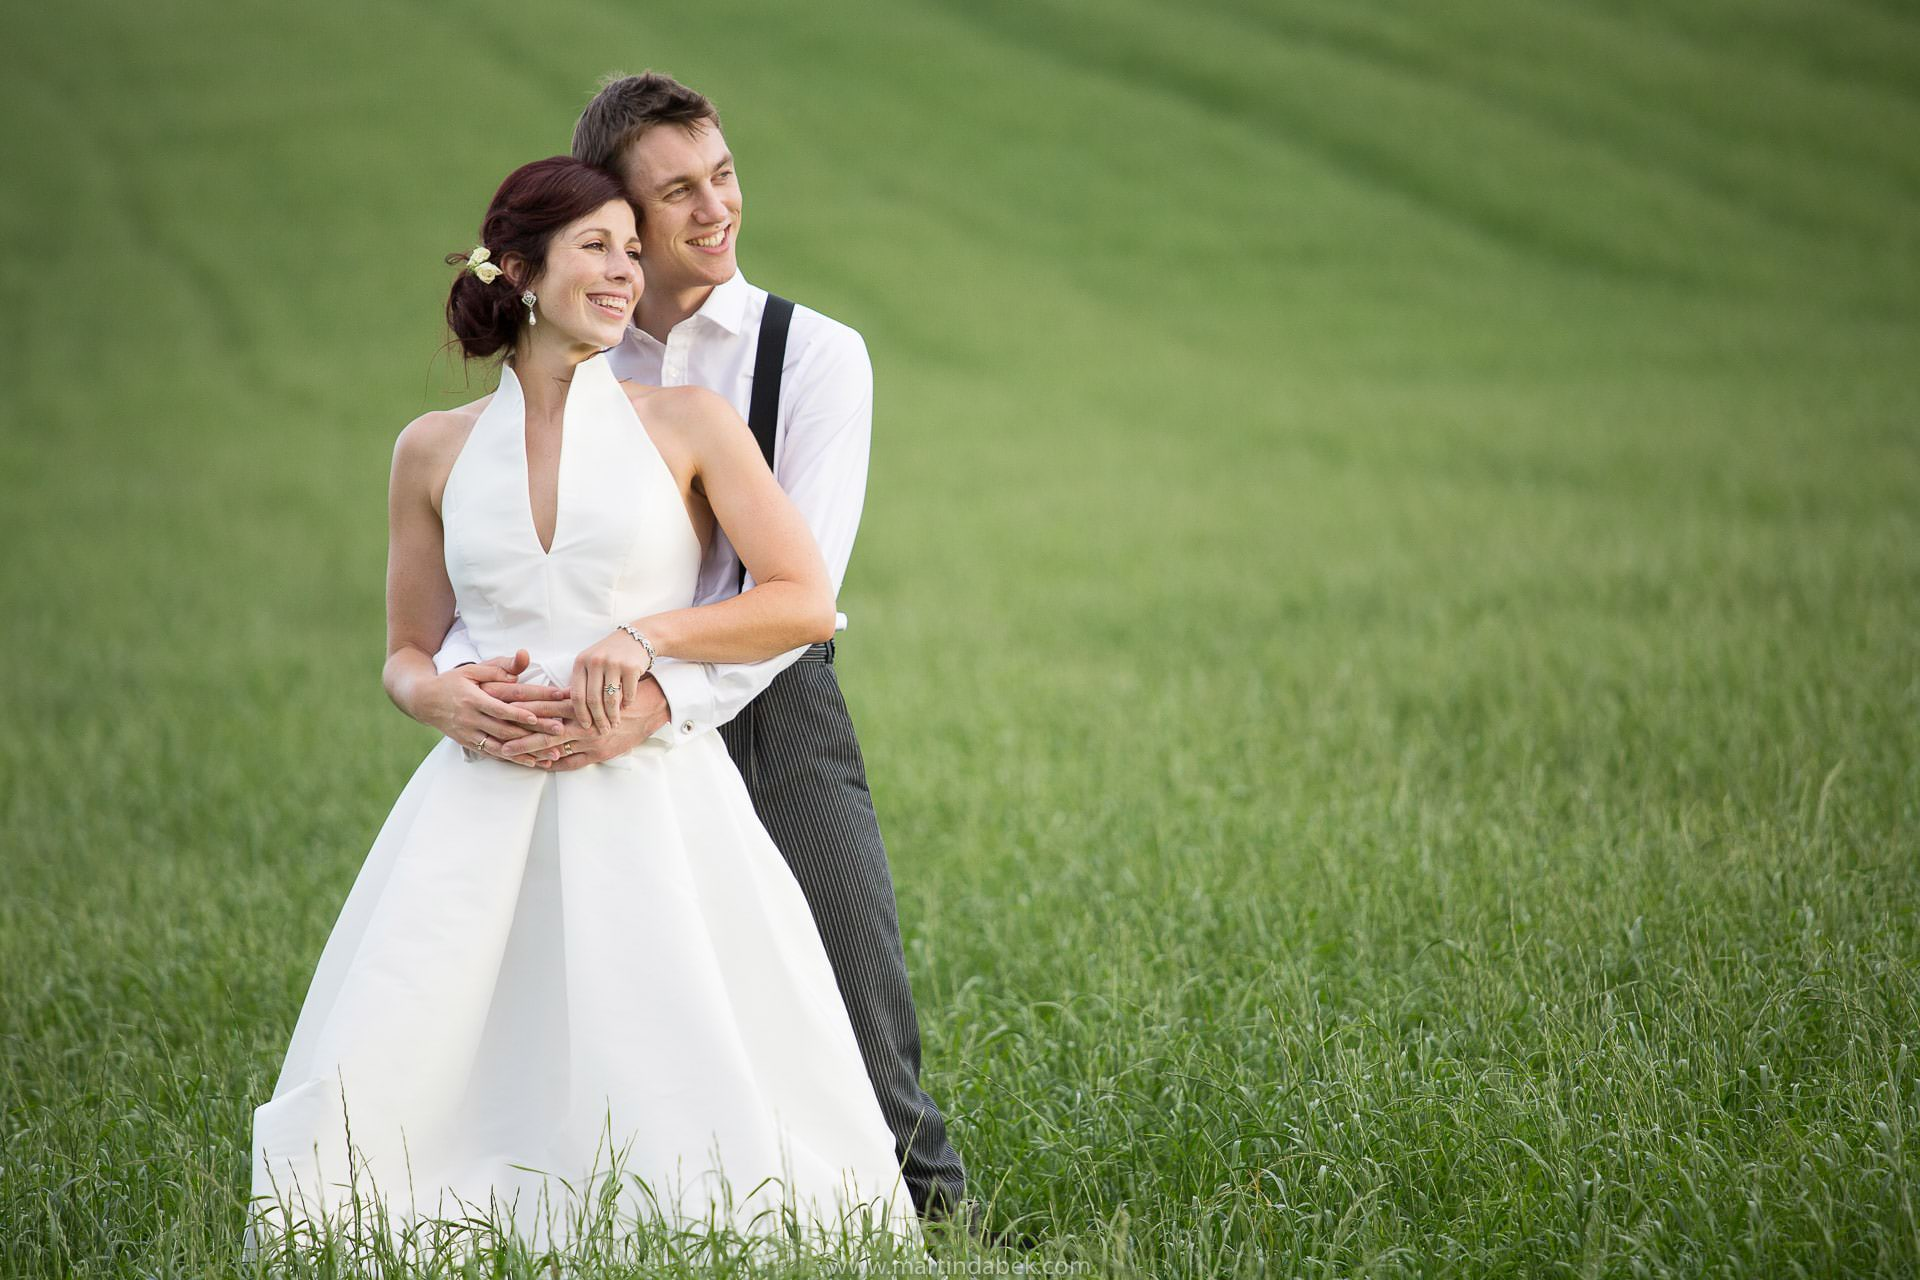 priston watermill wedding photography